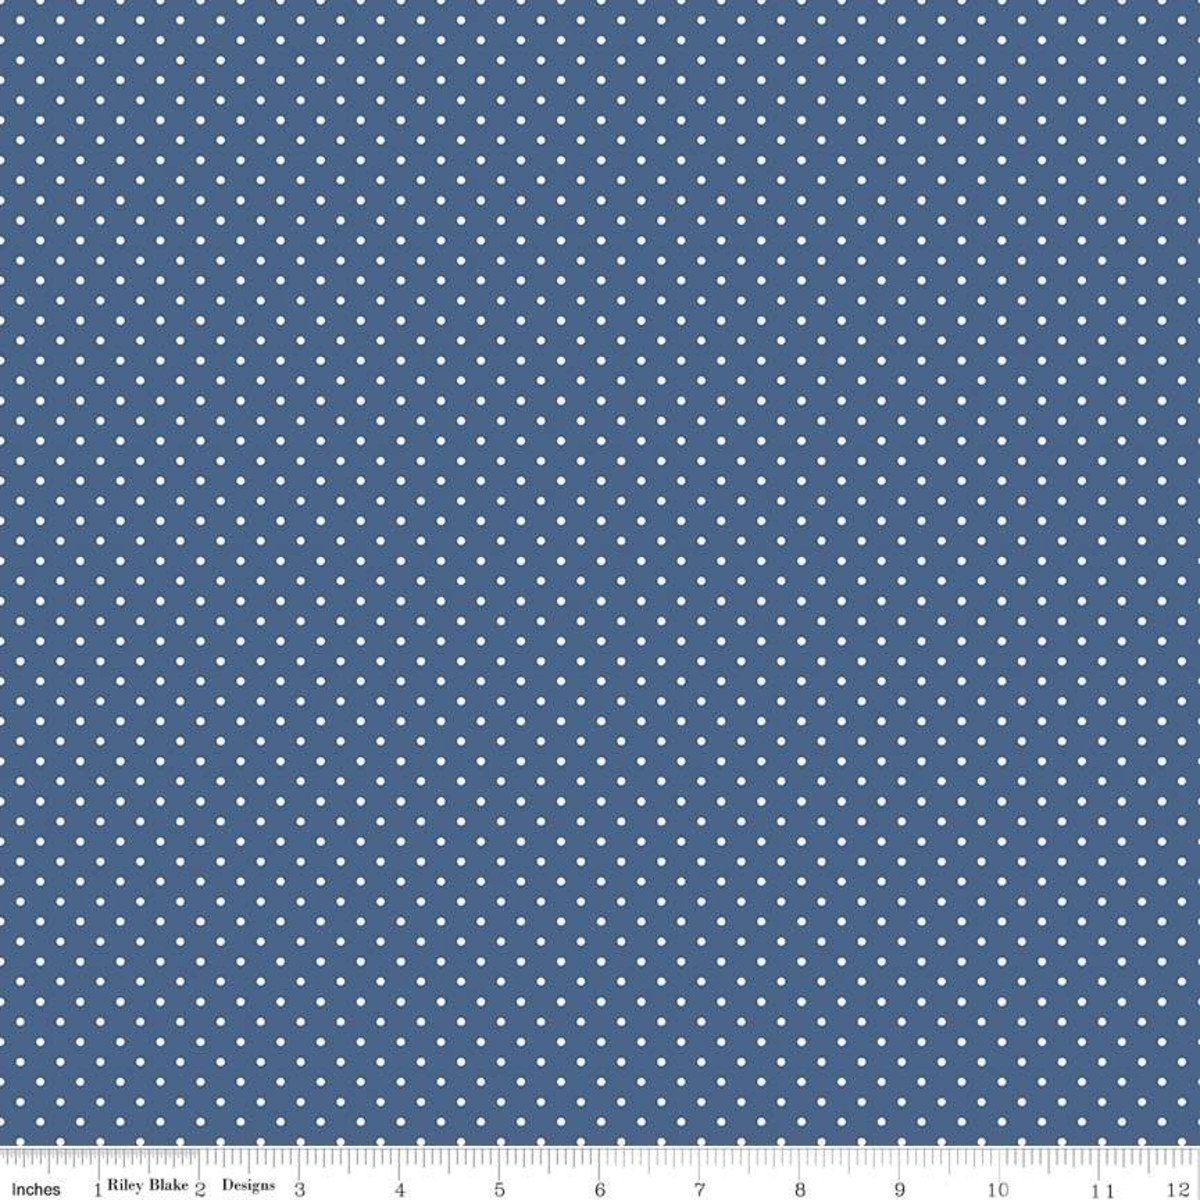 Riley Blake Designs, Swiss Dot - Swiss Dot Denim